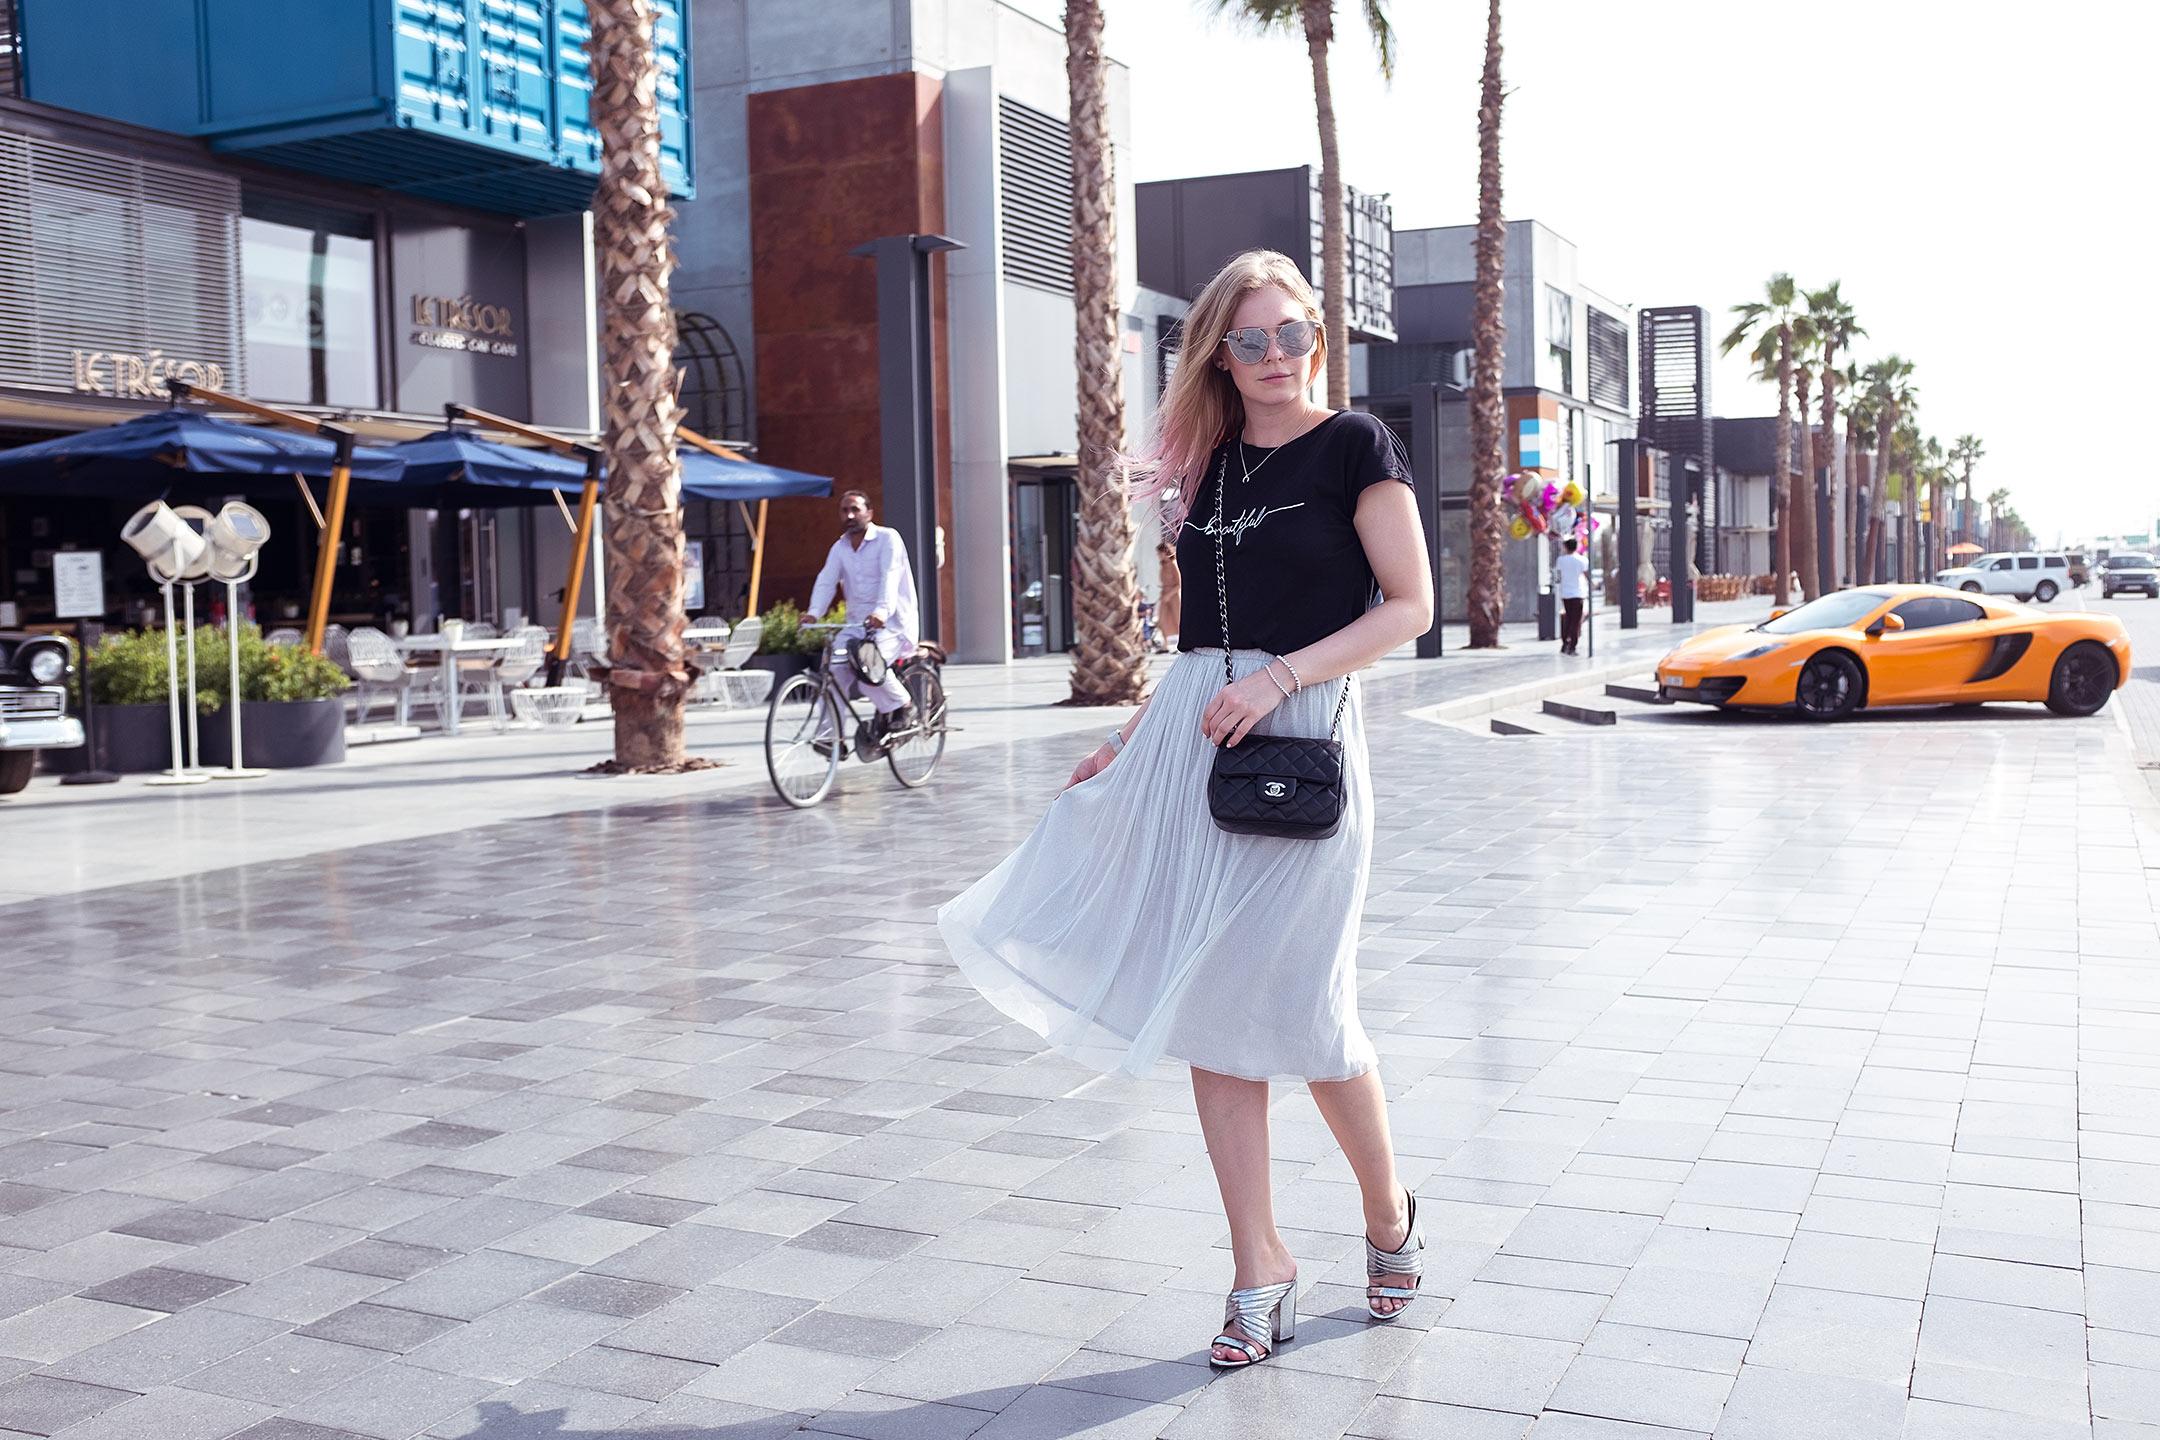 Mules Silber Trendschuh Sommerschuhe Outfit Fashionblog Düsseldorf-sunnyinga